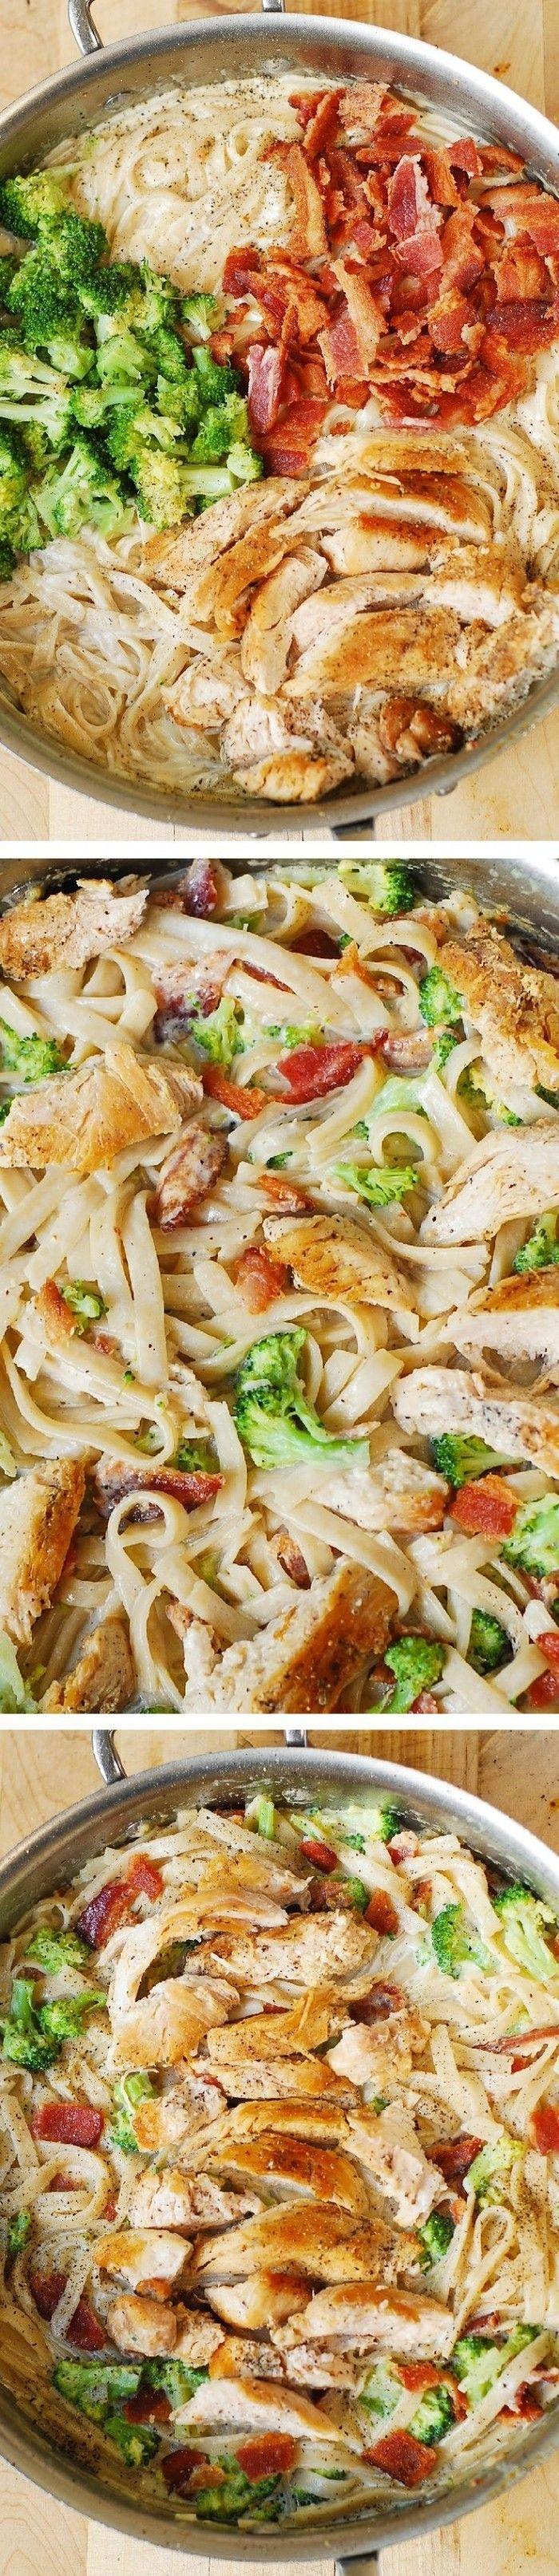 Creamy Broccoli, Chicken, and Bacon Pasta. Simple and delicious.